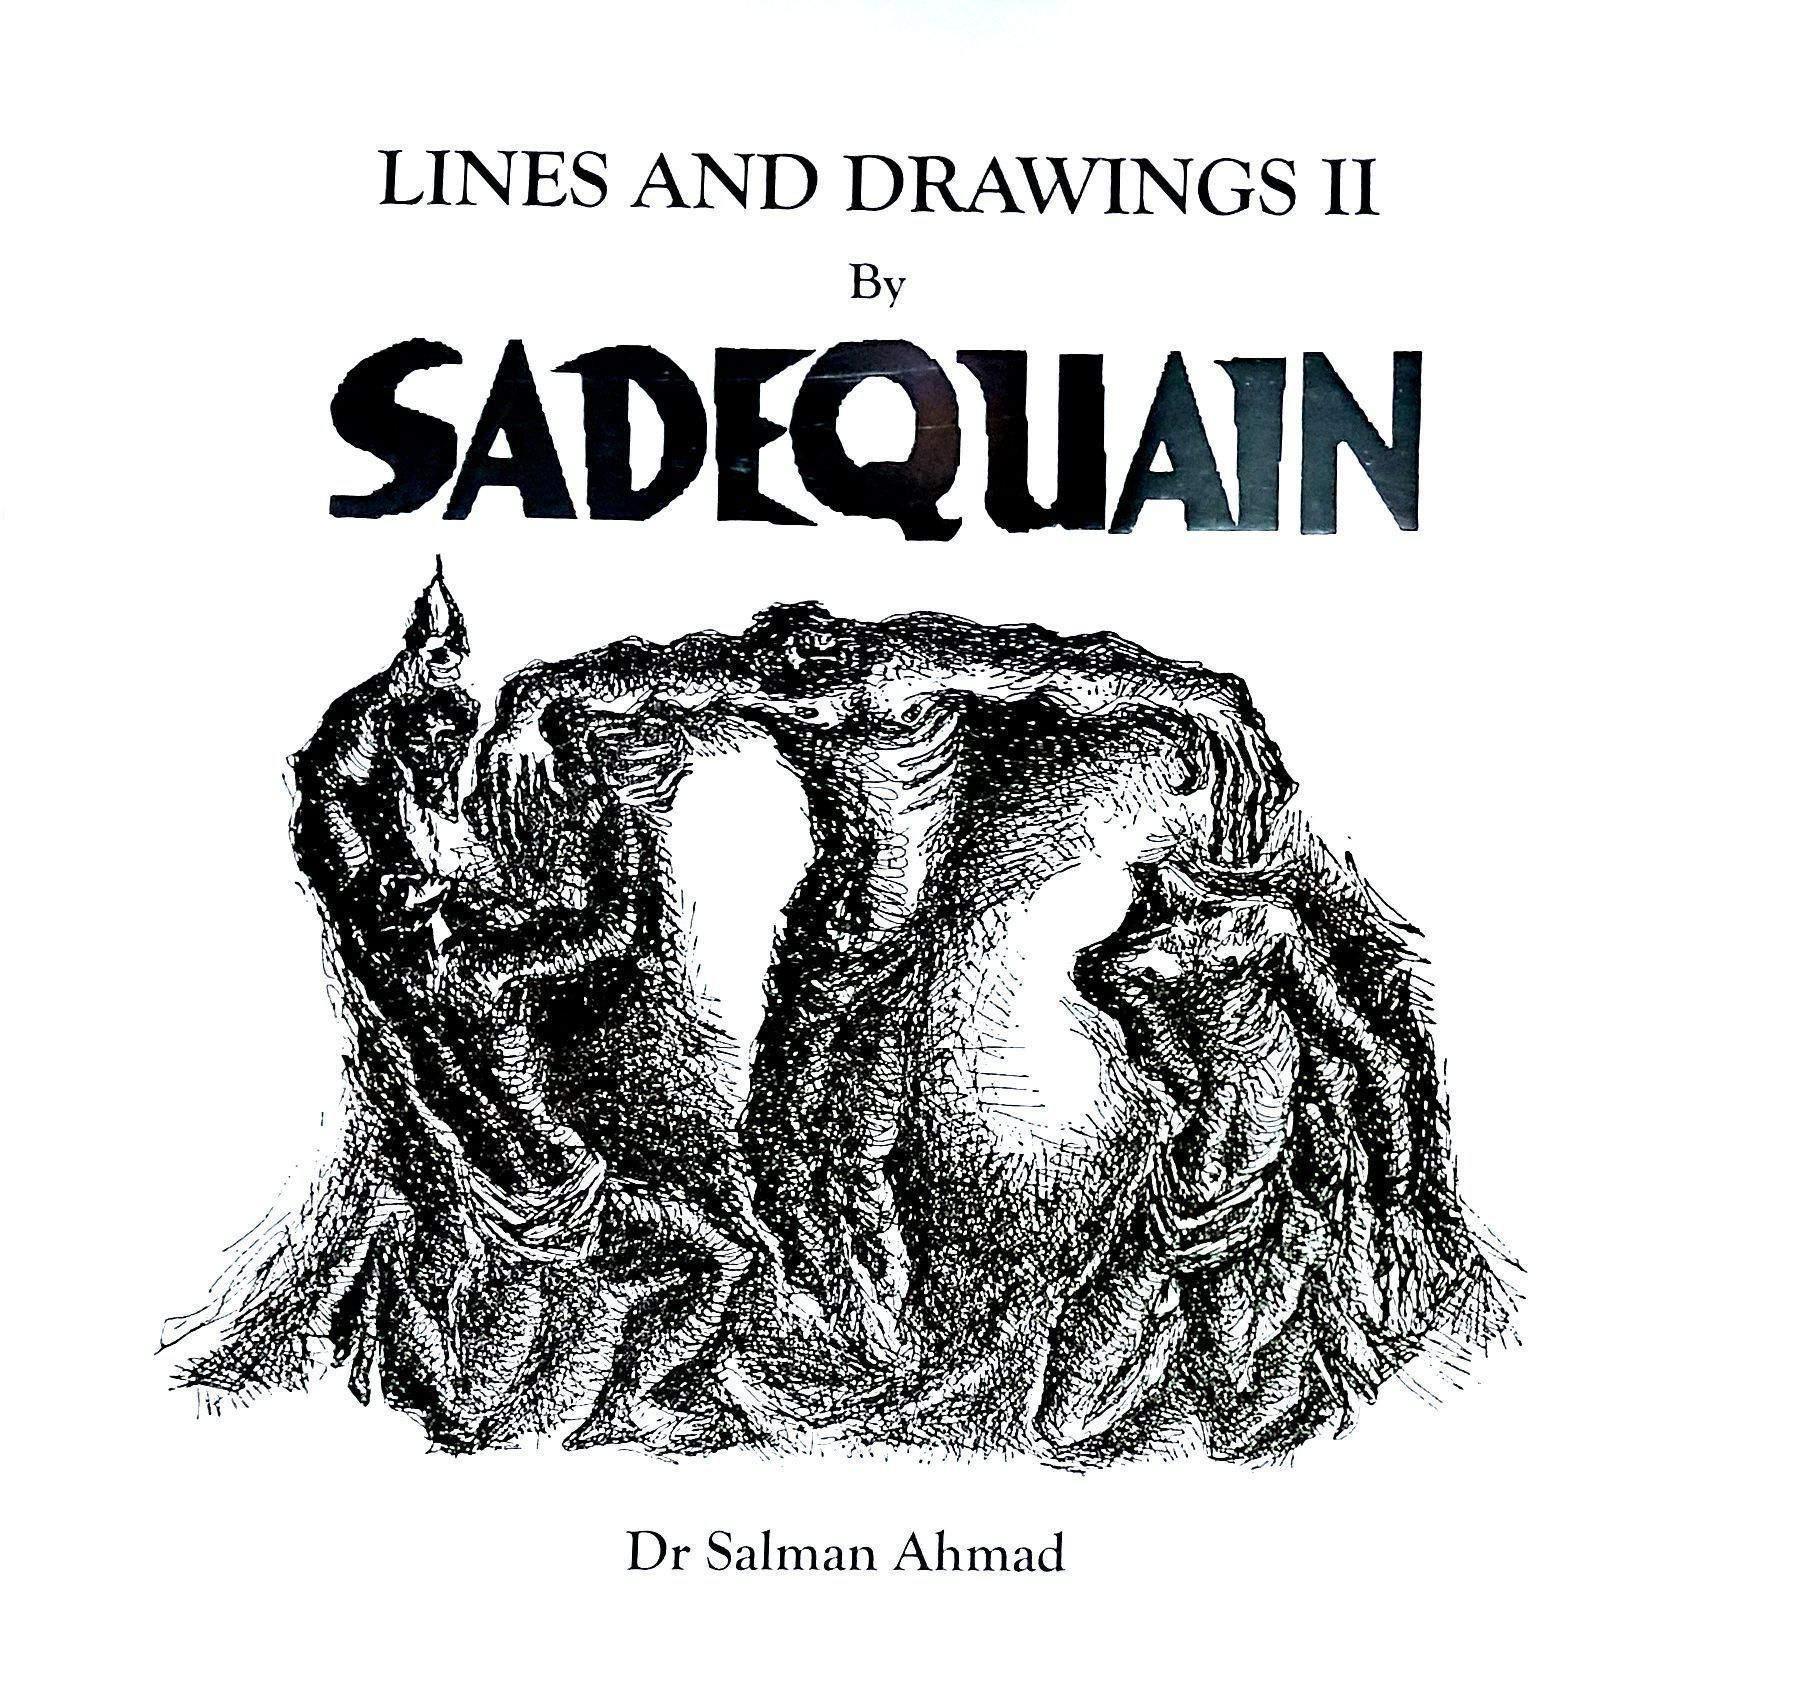 Lines and Drawings by SADEQUAIN